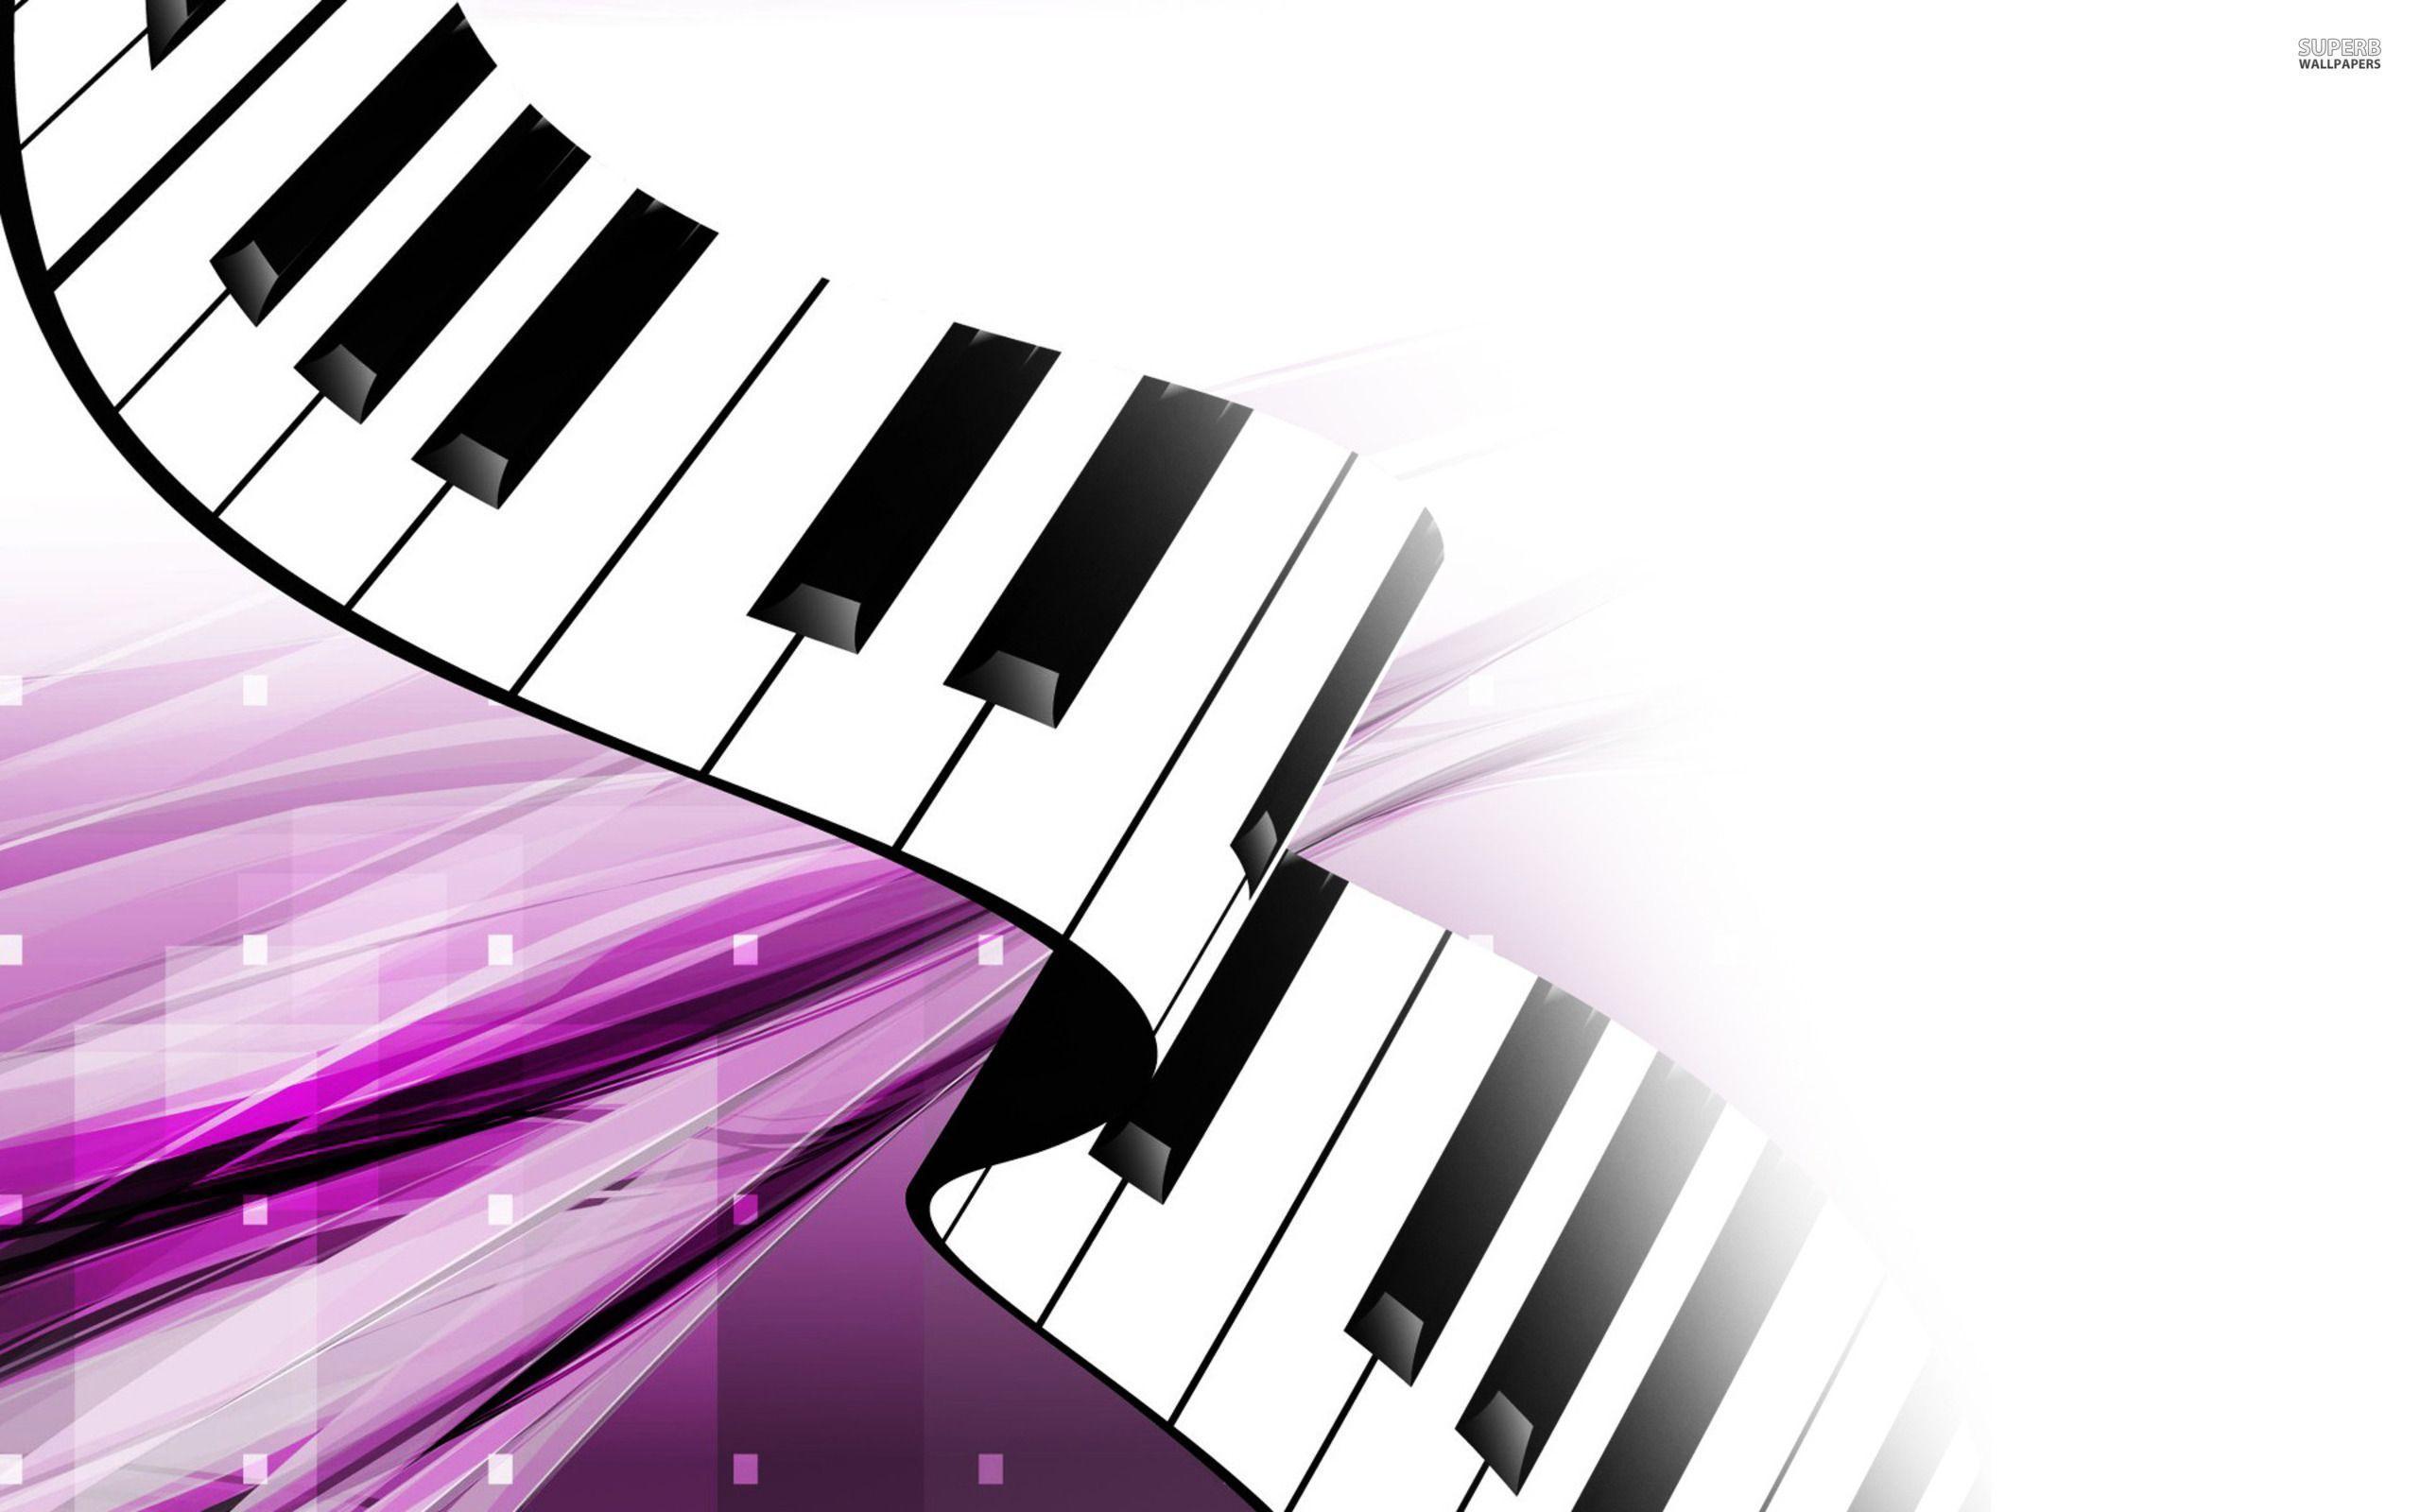 piano keyboard wallpapers graphic graphics cool background dance desktop musical tablet clipart wallpapersafari visitar wallpapercave computer источник avante biz fondos